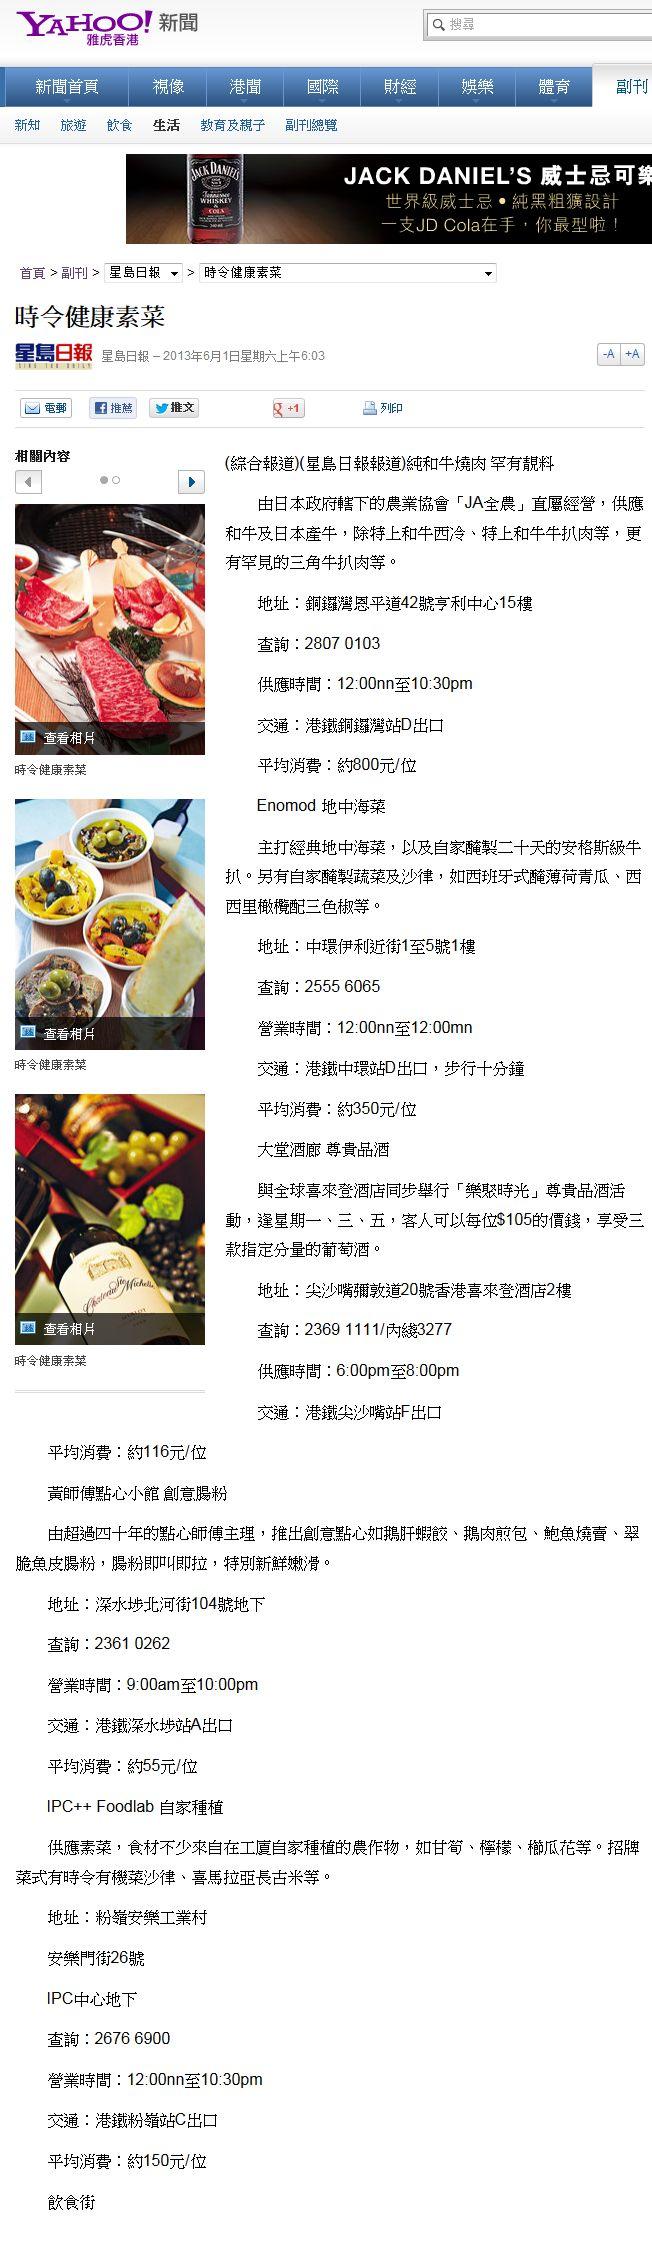 ENOMOD - 01.06 - Yahoo HK.jpg